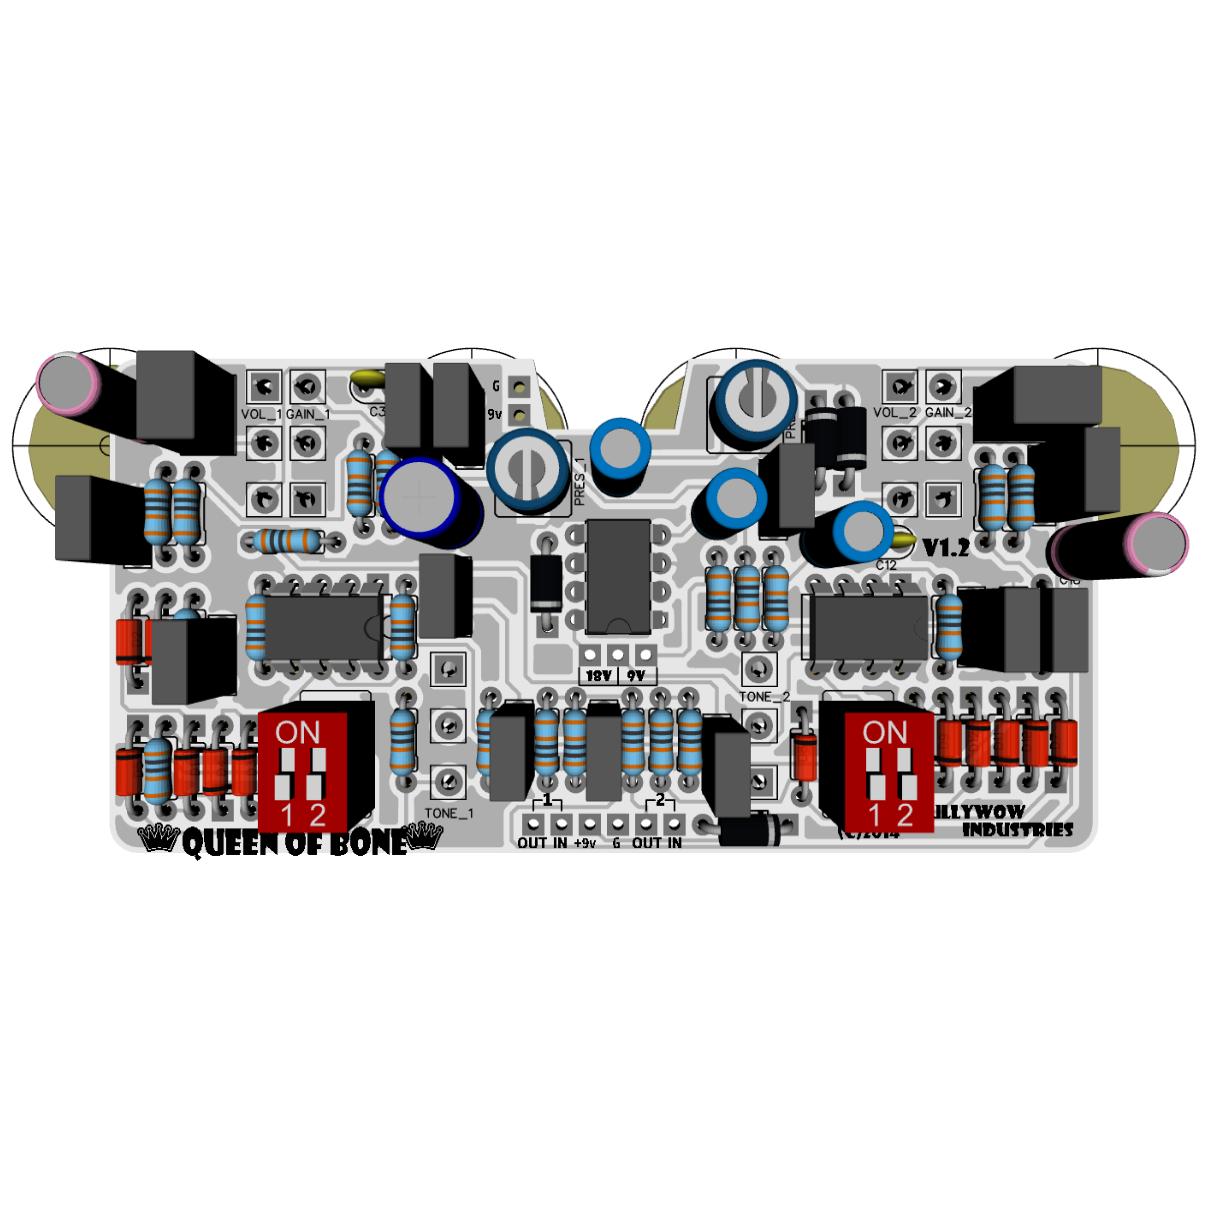 Queen Of Bone King Tone 18v Clone Pcb Rullywow Diy Guitar Distortion Pedal Wiring Diagram